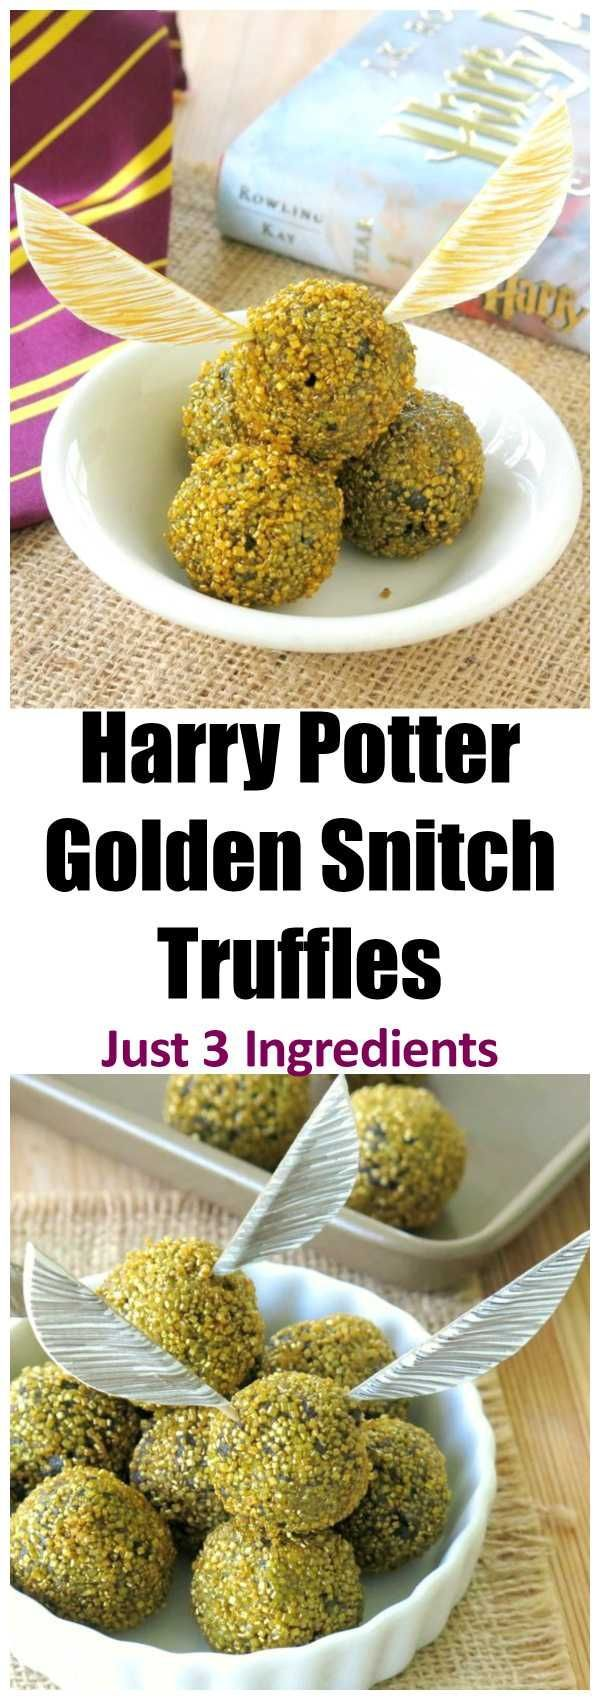 harry potter golden snitch truffles recipe just 3 ingredients plus